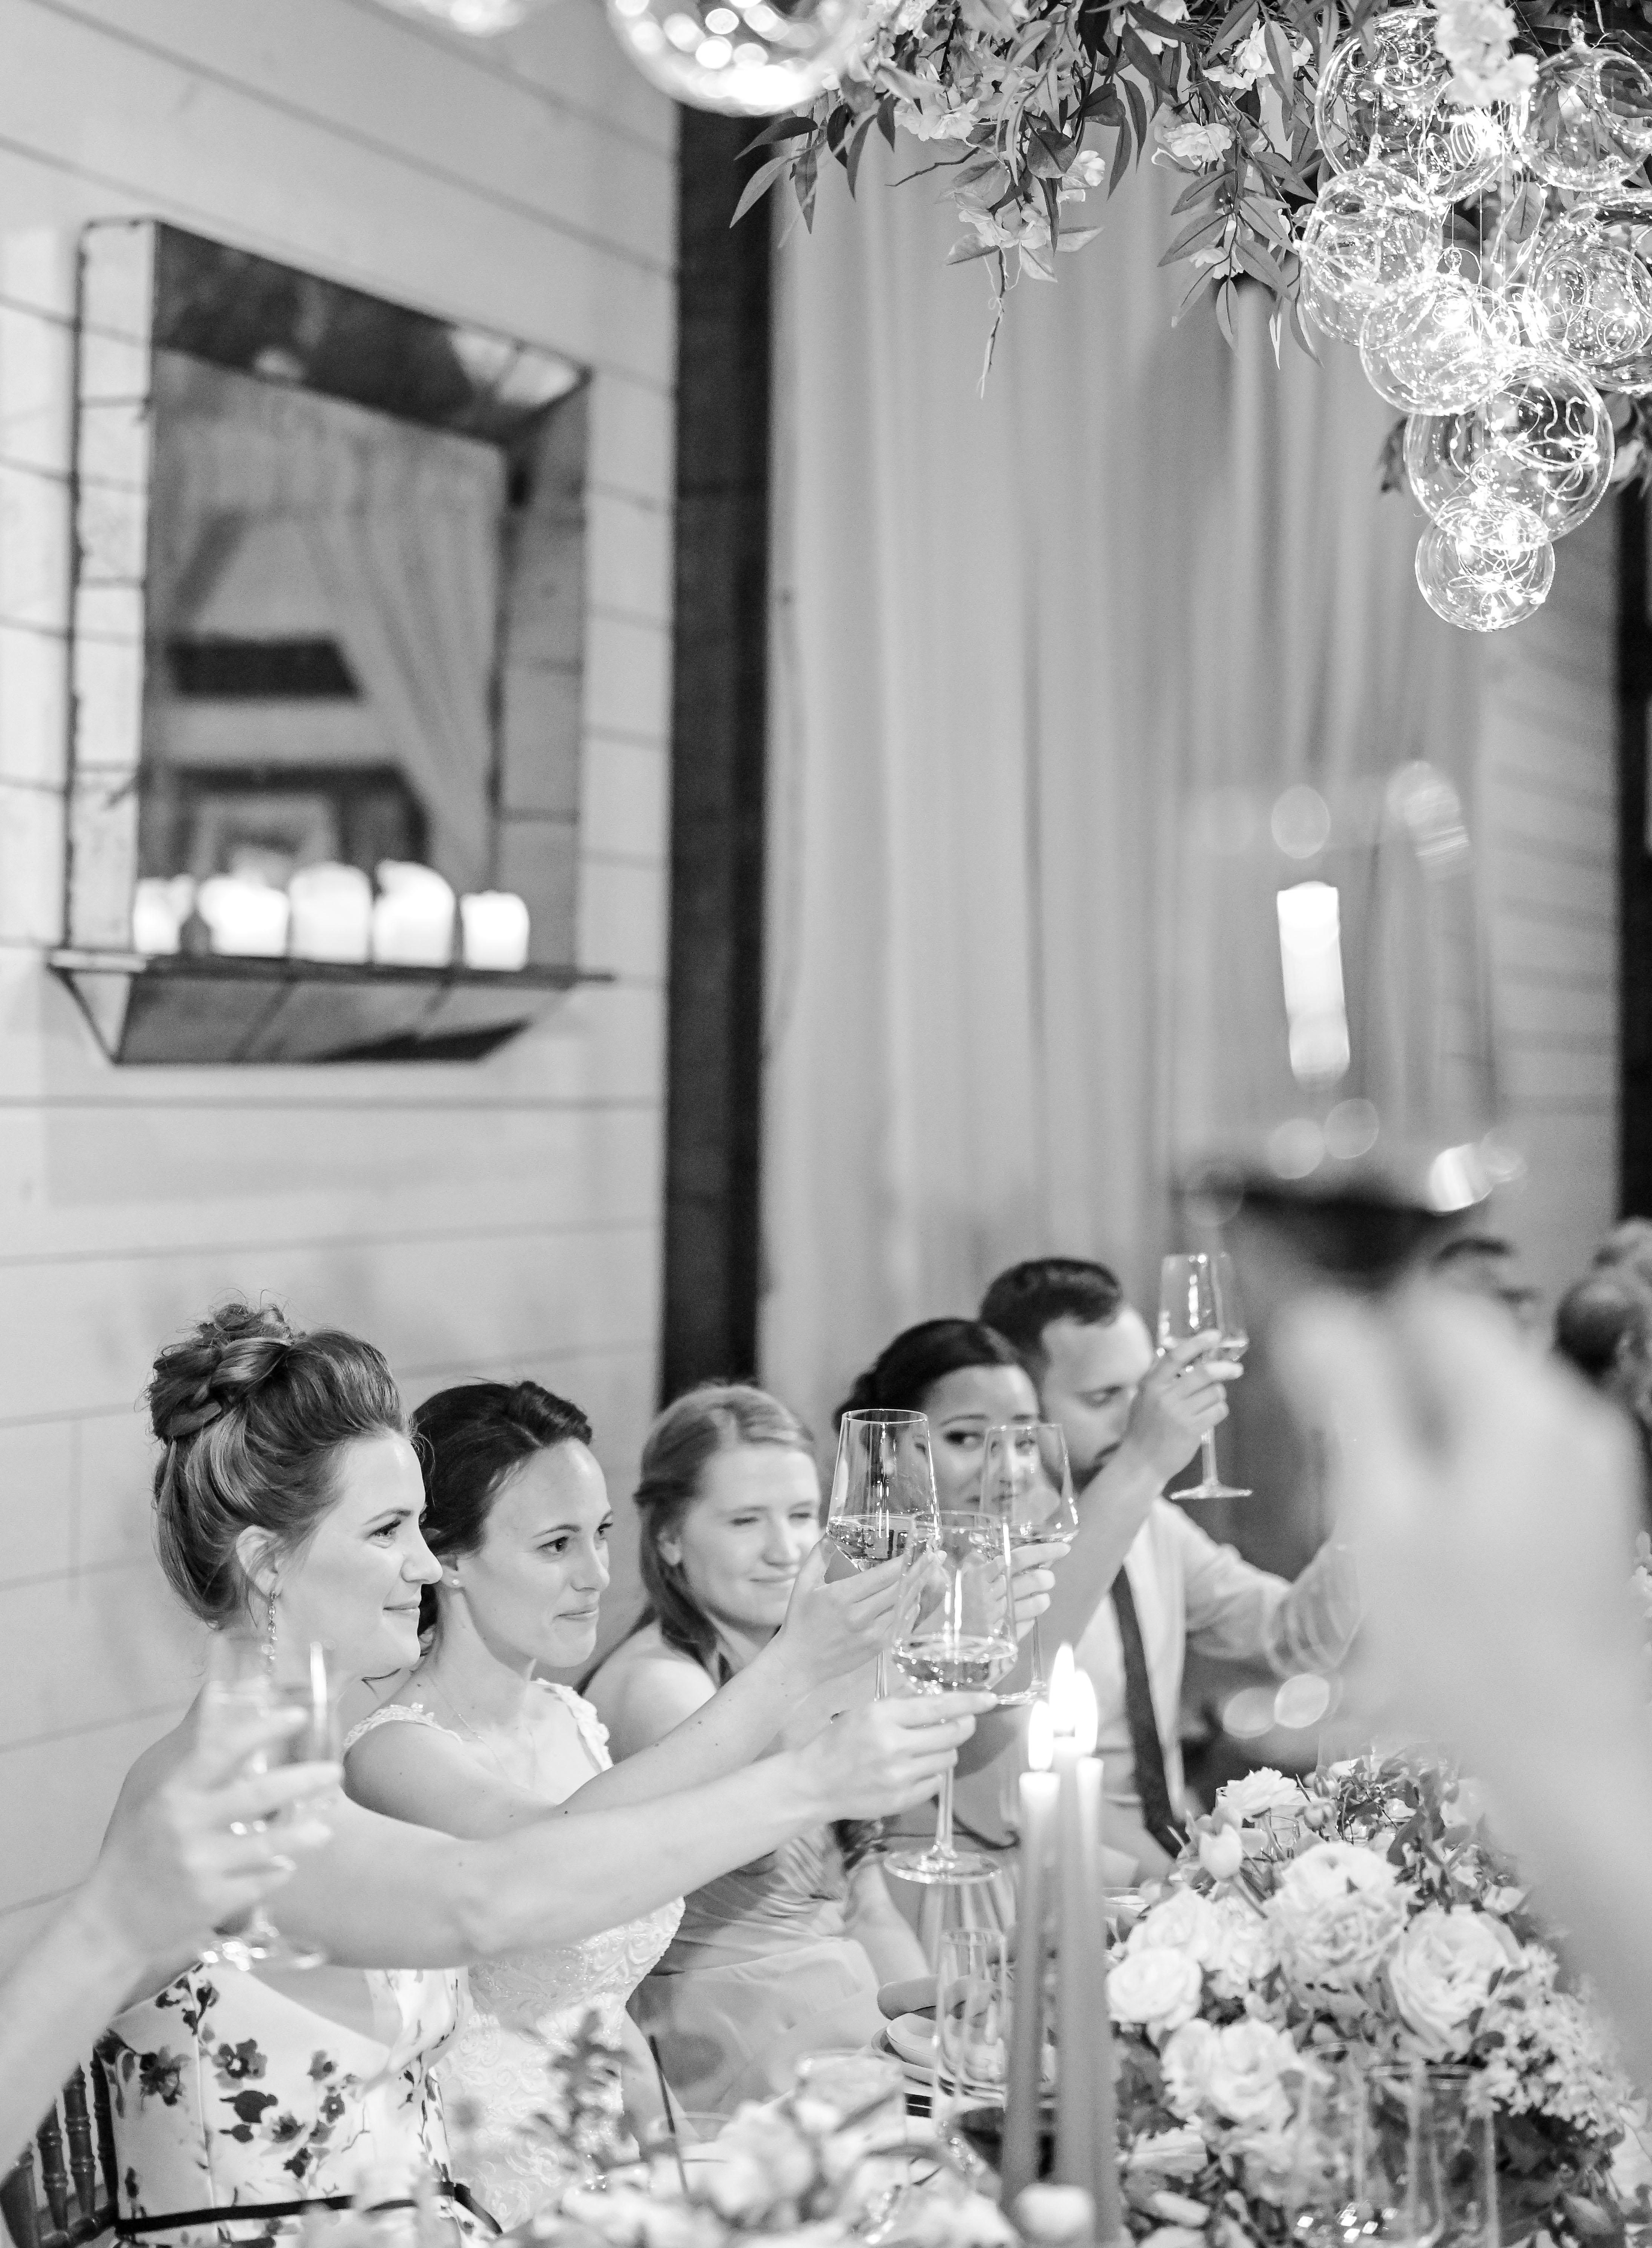 mechelle julia wedding black and white toast glasses